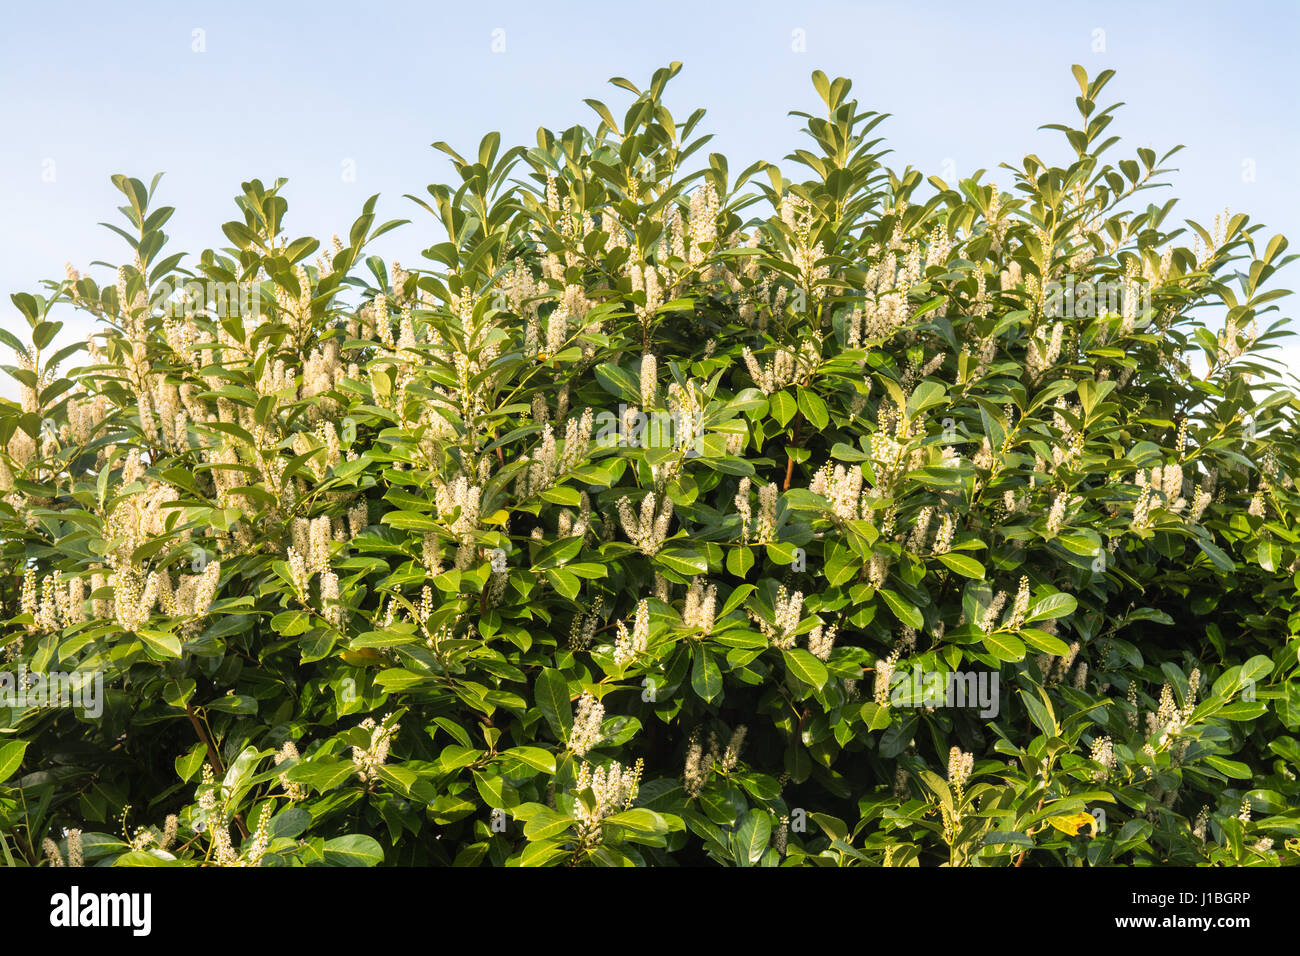 Kirschlorbeer-Blumen im Frühling - Prunus Laurocerasus Blumen Stockbild